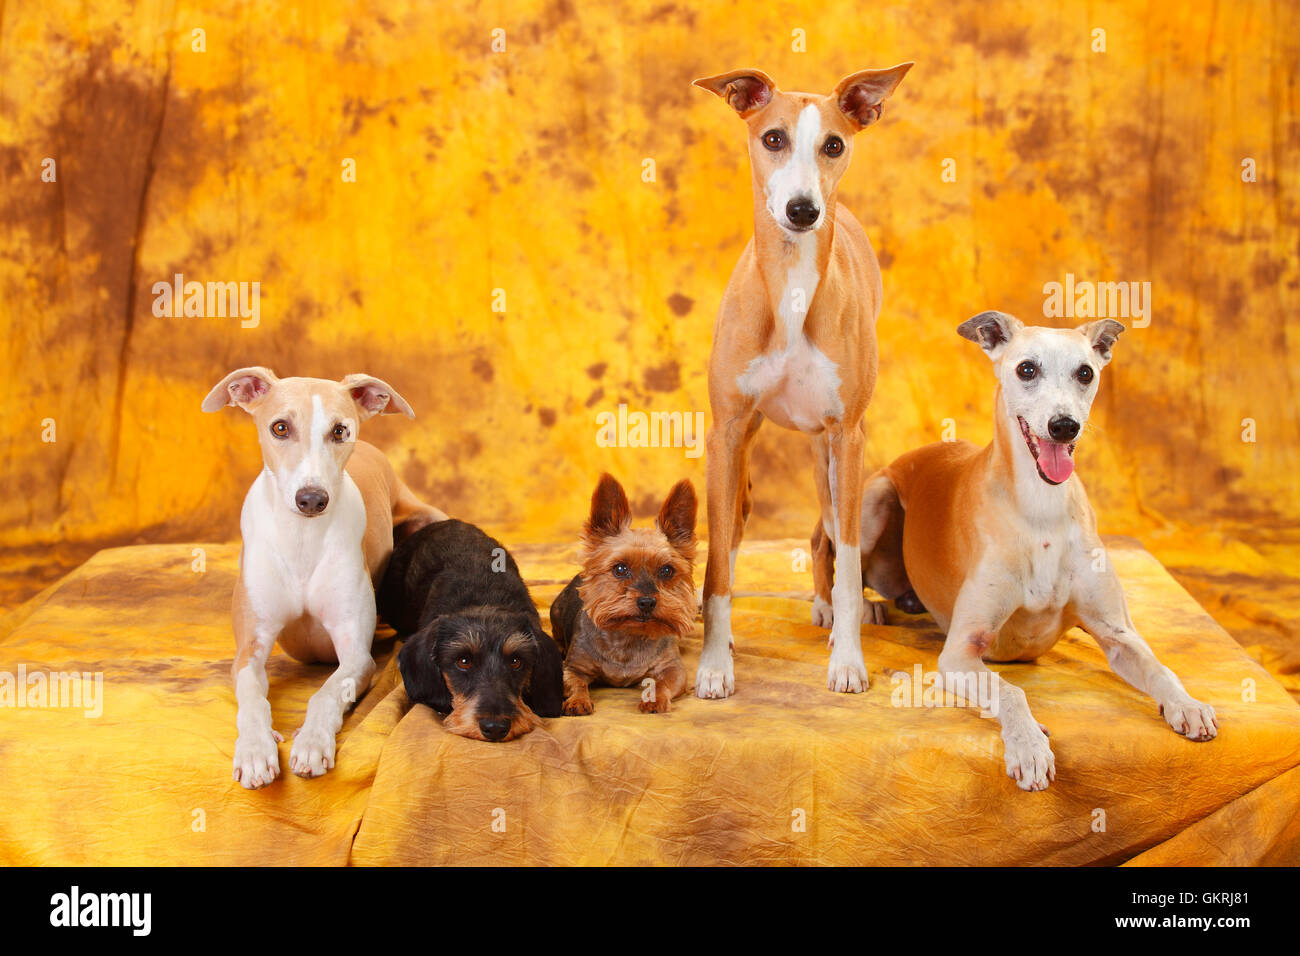 Yorkshire Terrier, Miniature Wirehaired Dachshund and Whippet Yorkshire Terrier, Zwergrauhaardackel und Whippet Stock Photo